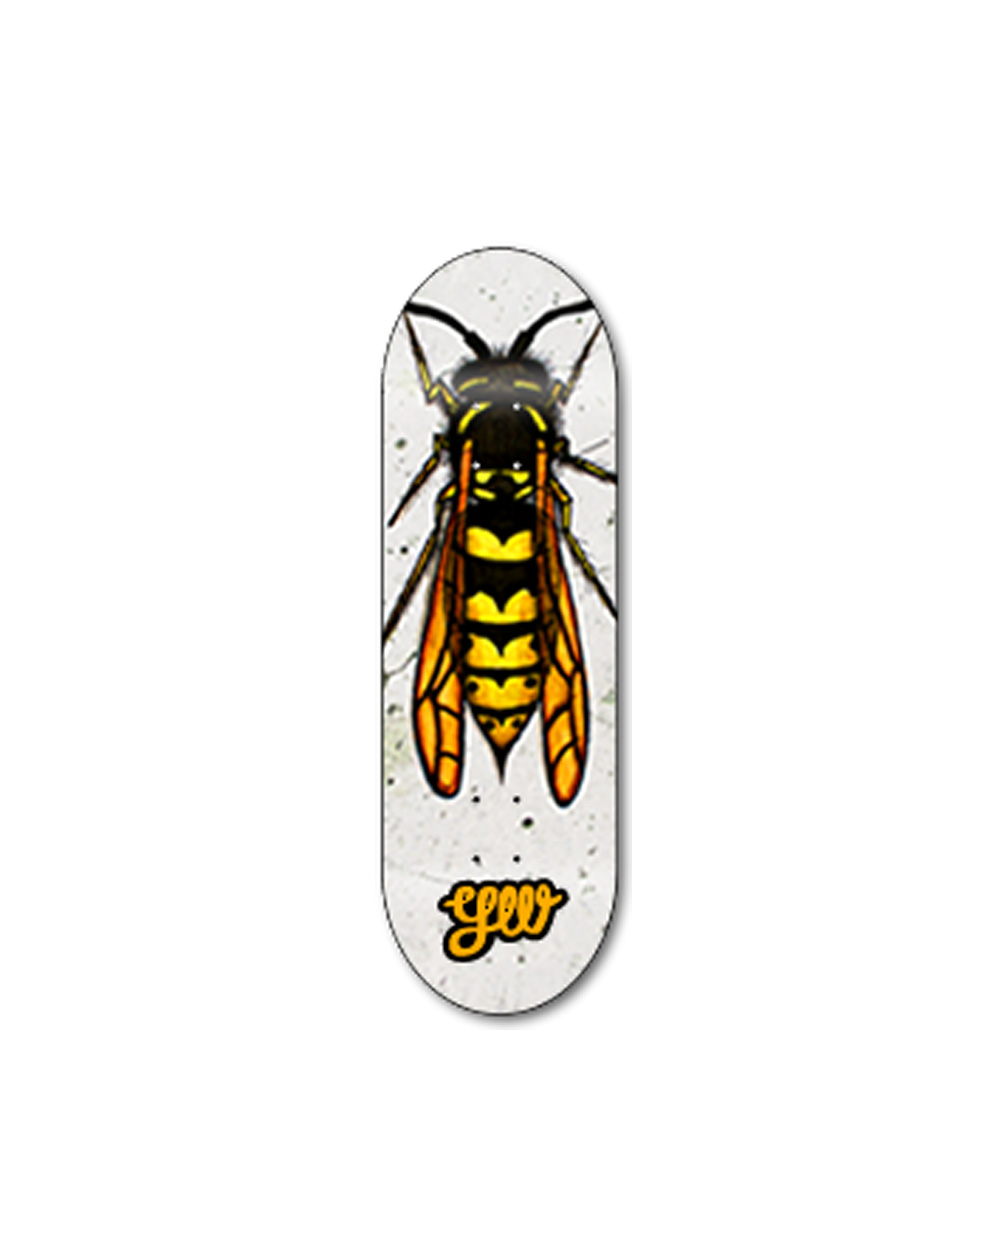 Yellowood Plateaux Fingerboard Wasp Z3